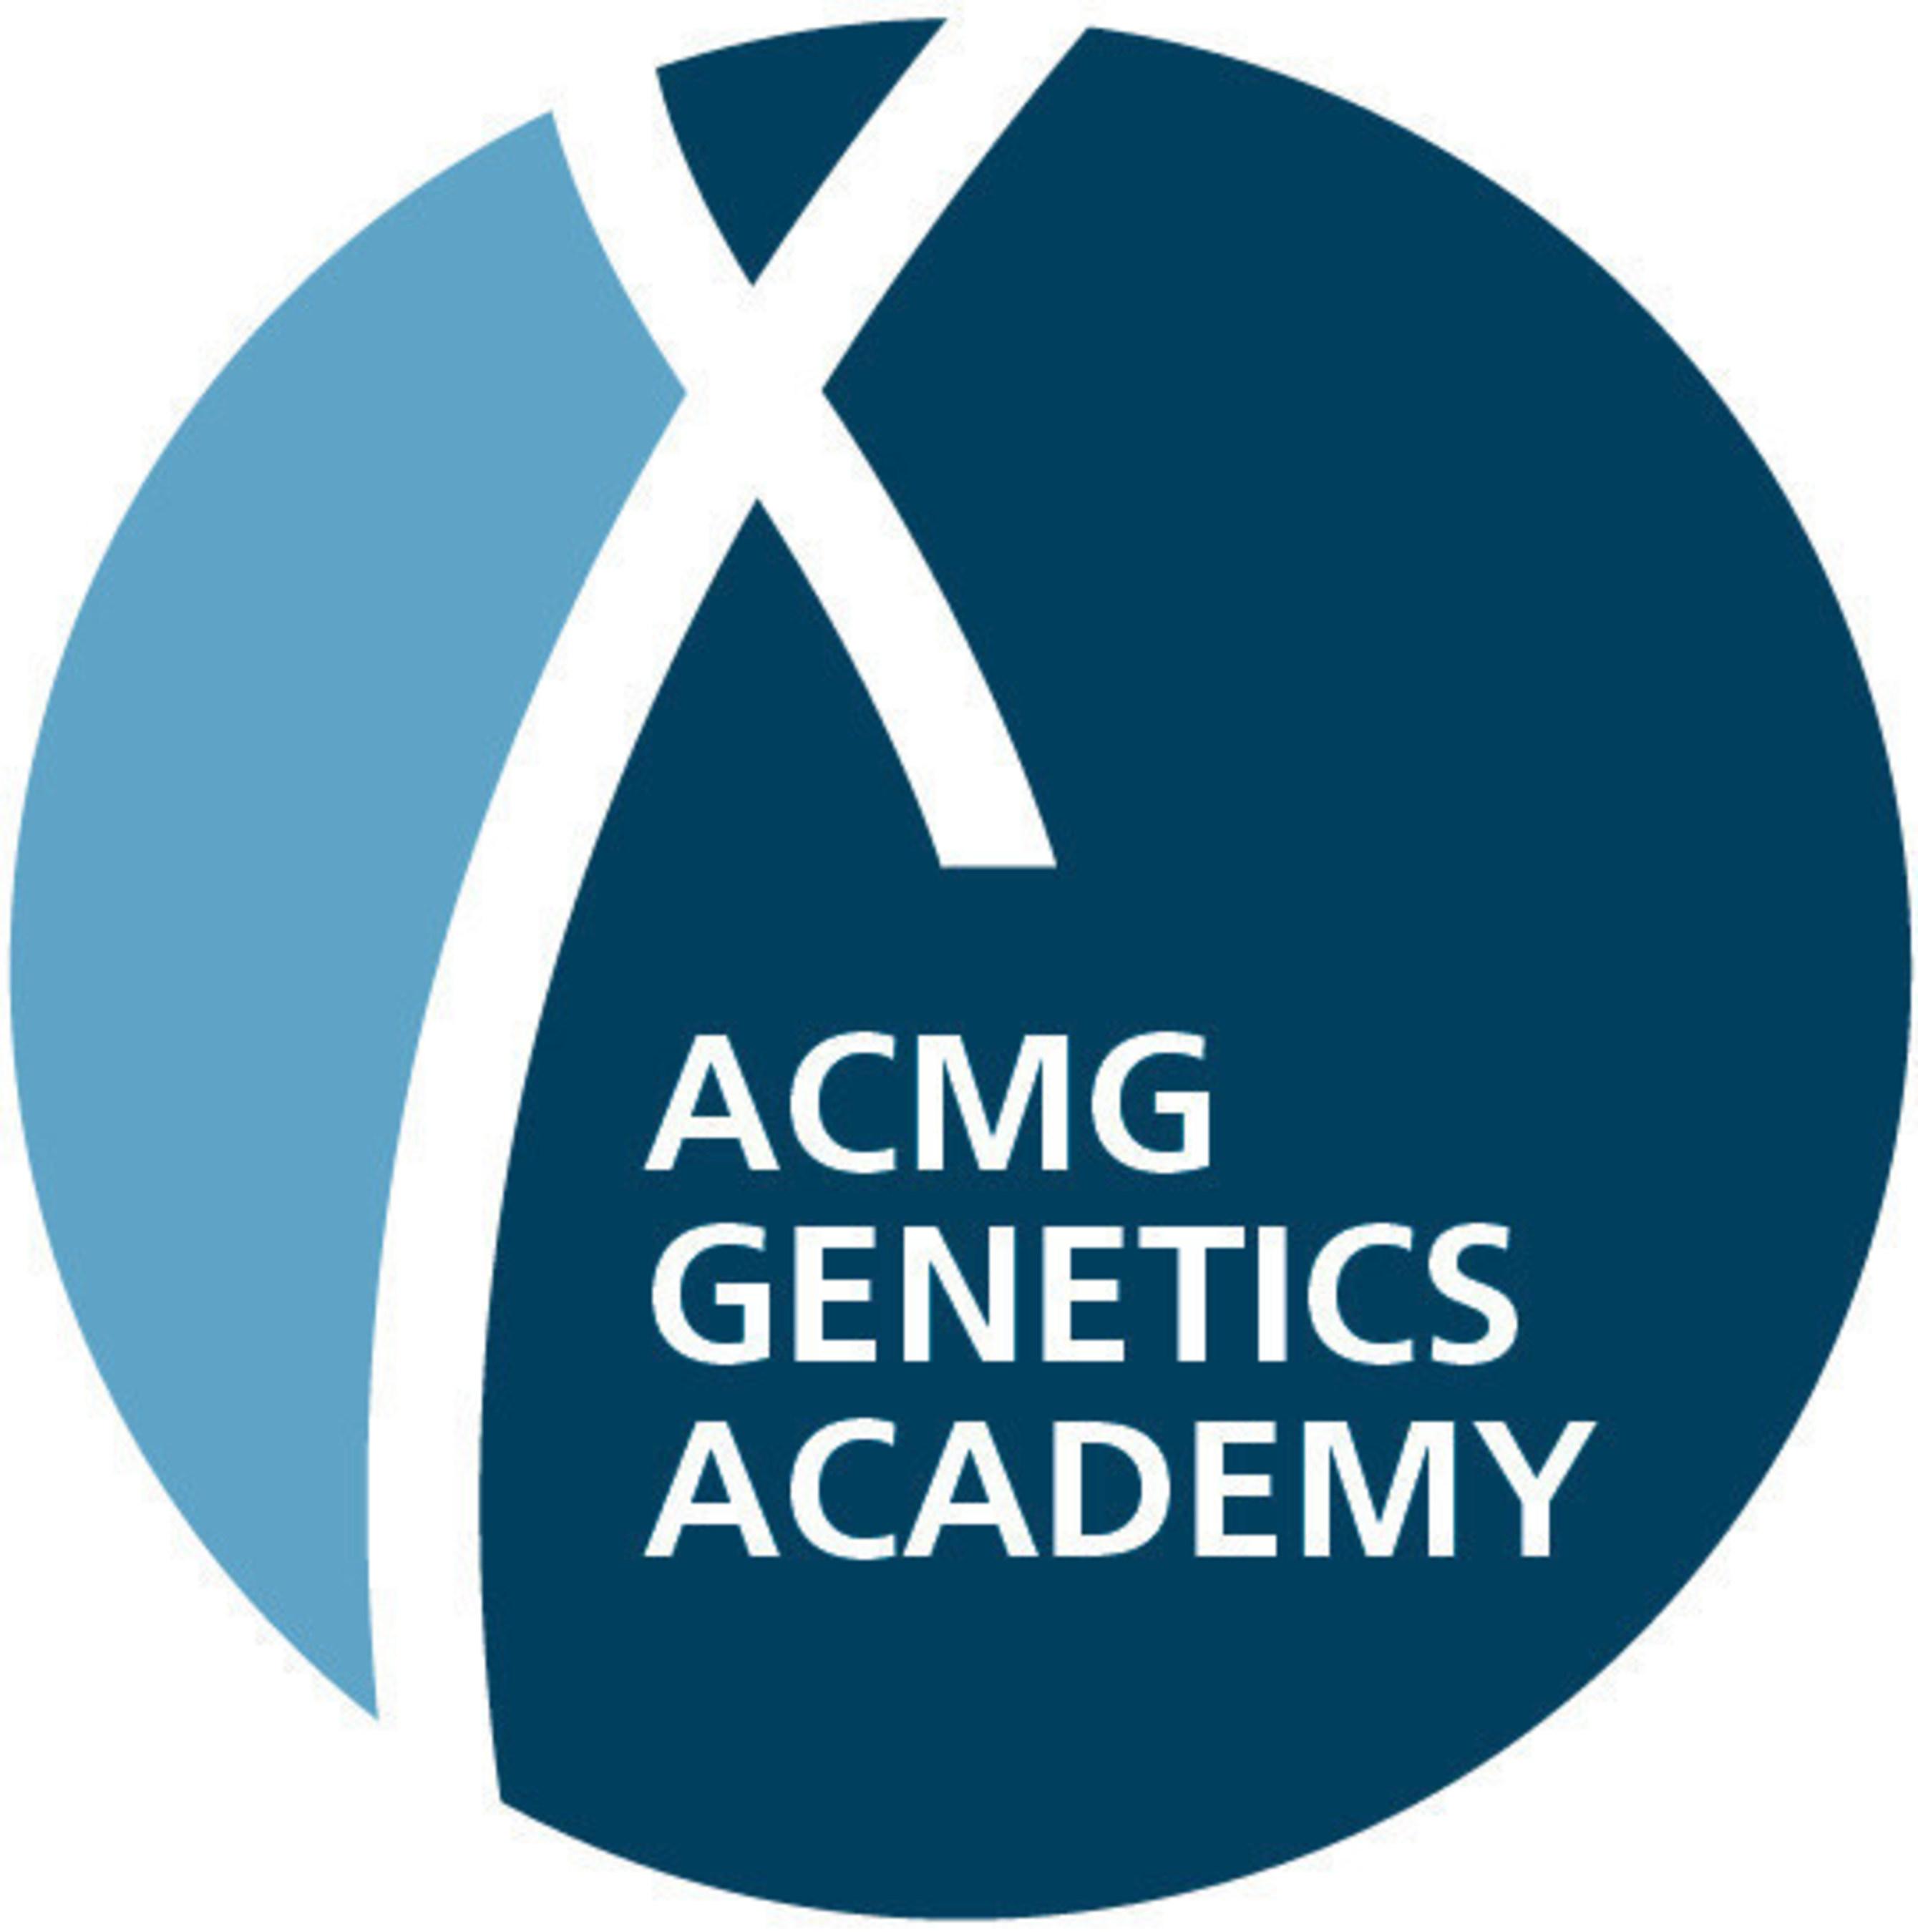 American College of Medical Genetics and Genomics (ACMG) Announces New Online 'Genetics Academy'